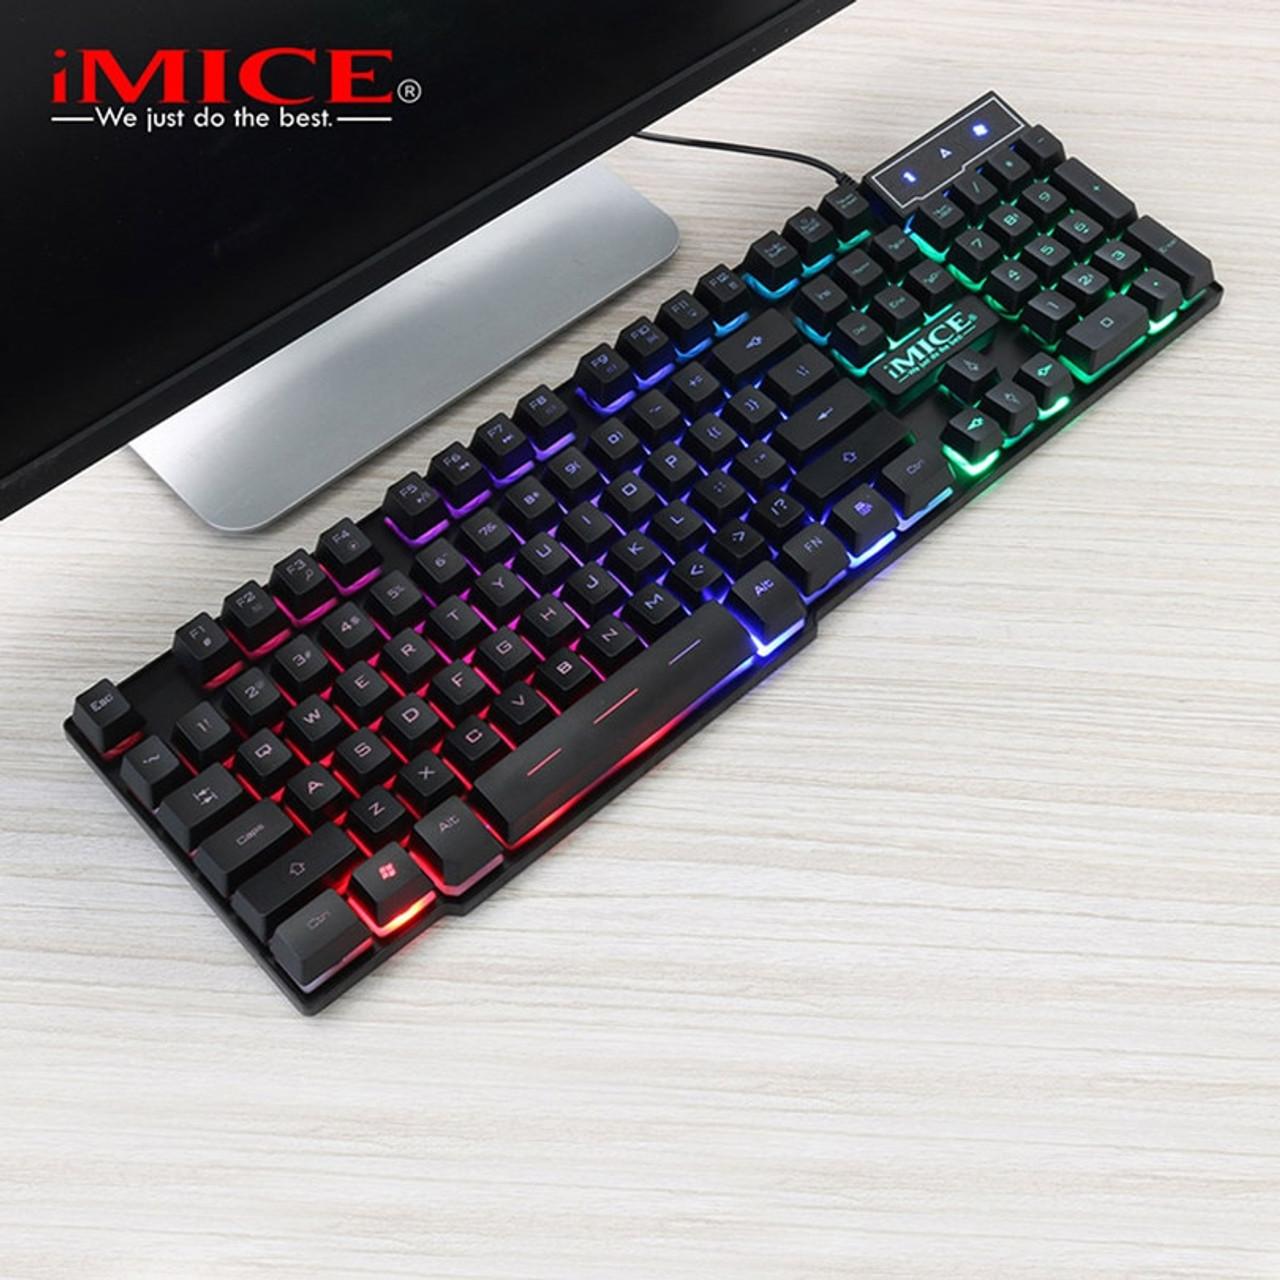 43ec13d8a88 ... Wired Gaming Keyboard Mechanical Feeling Backlit Keyboards USB 104  Keycaps Russian Keyboard Waterproof Computer Game Keyboards ...